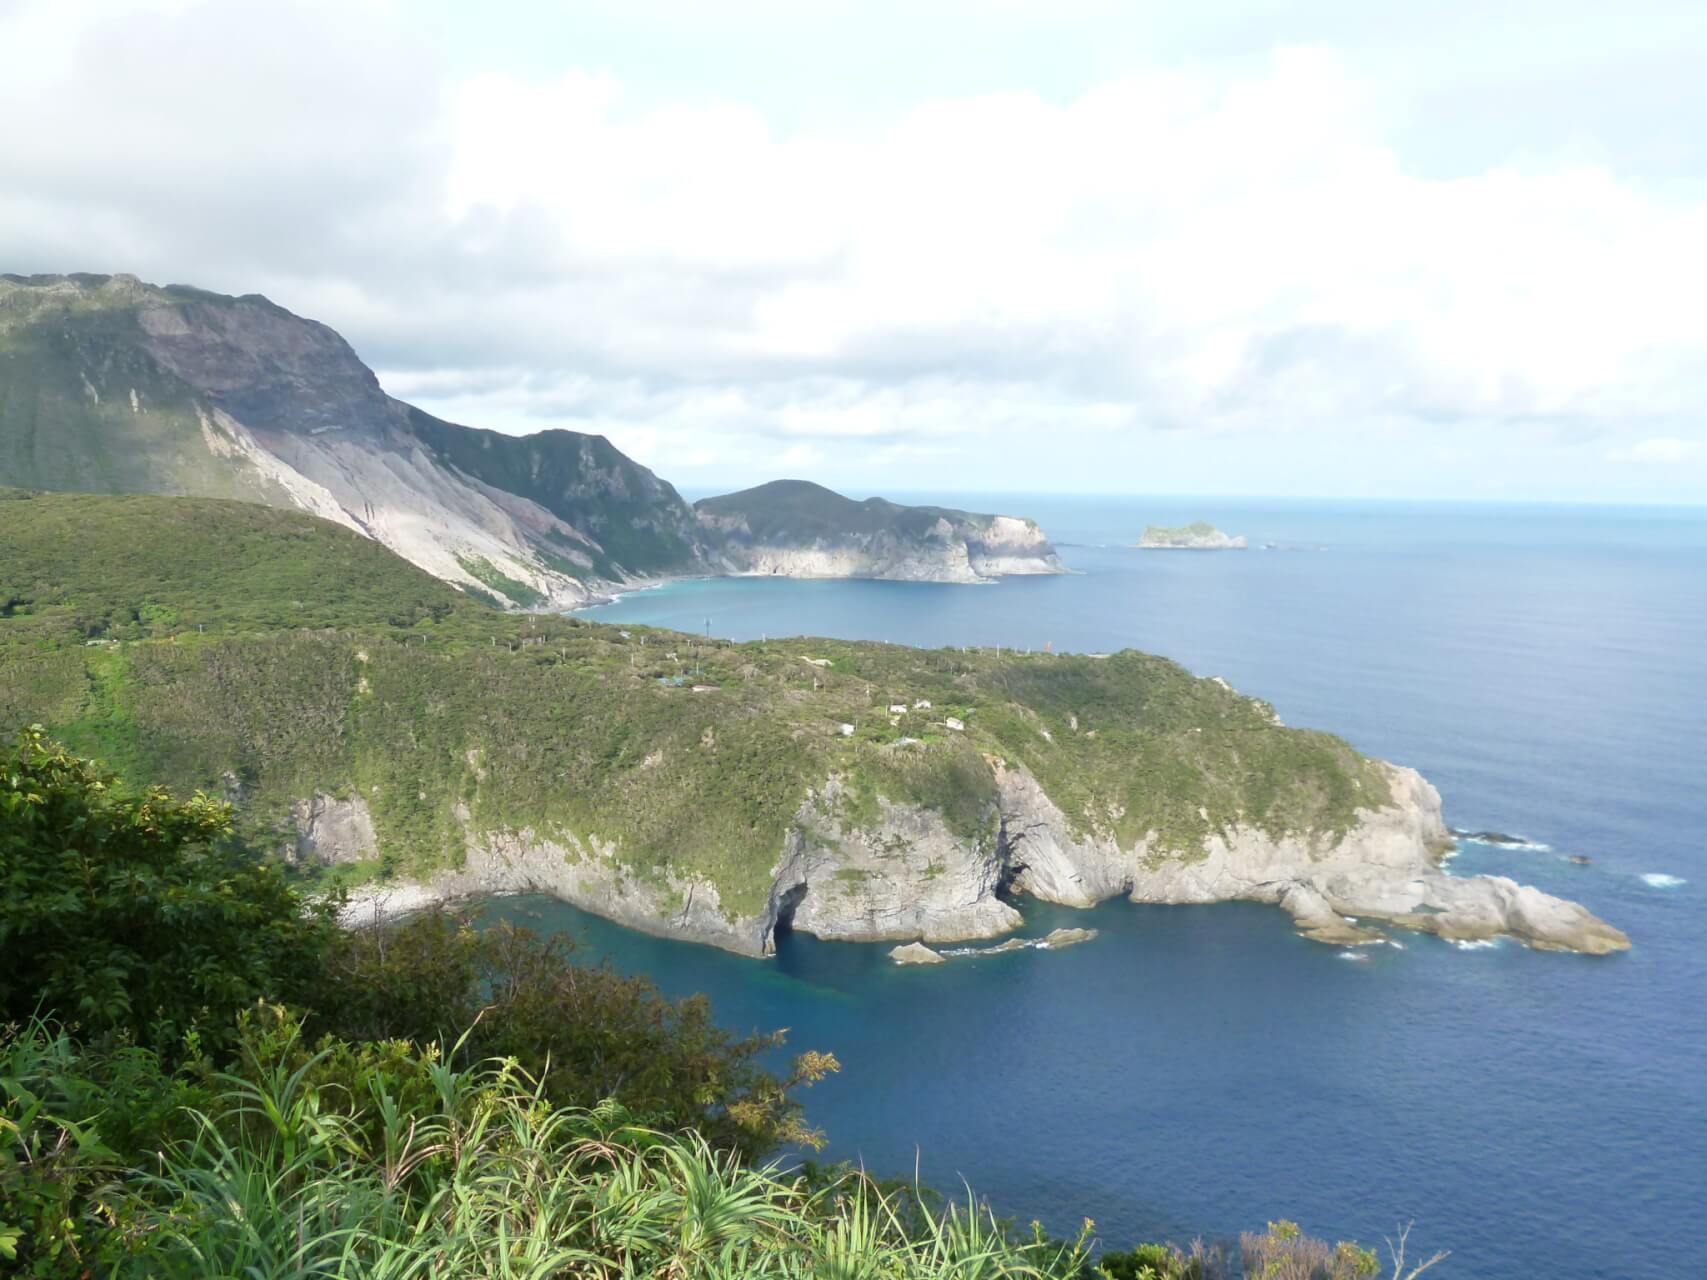 【国内・離島旅行】伊豆七島 椿咲く大島、利島と星降る神津島3島巡り【3日間】